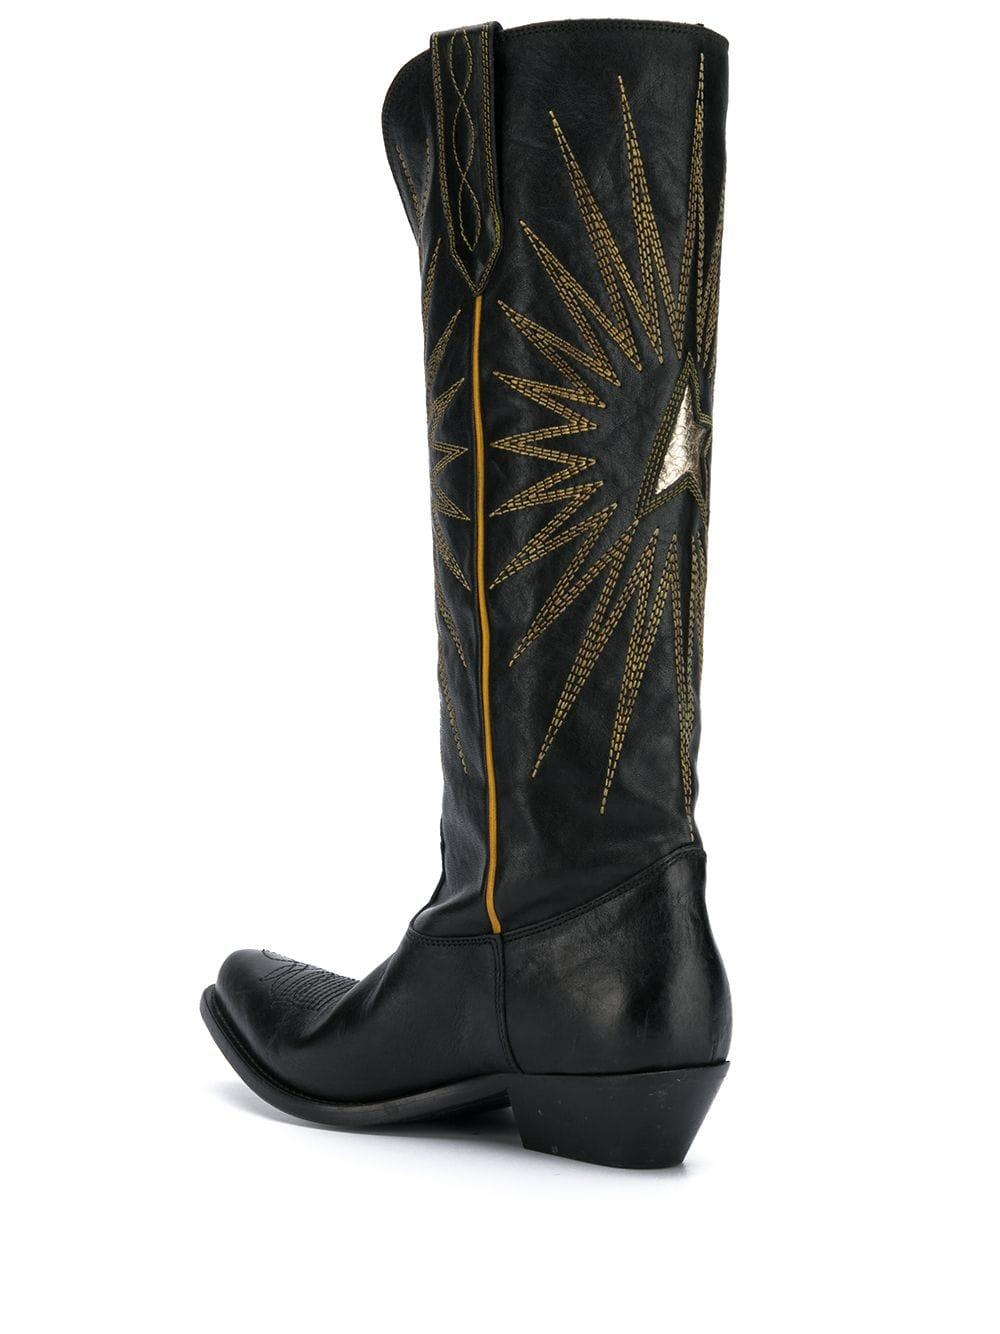 Botas estilo western Wish Star Golden Goose Deluxe Brand de Pluma de oca de color Negro